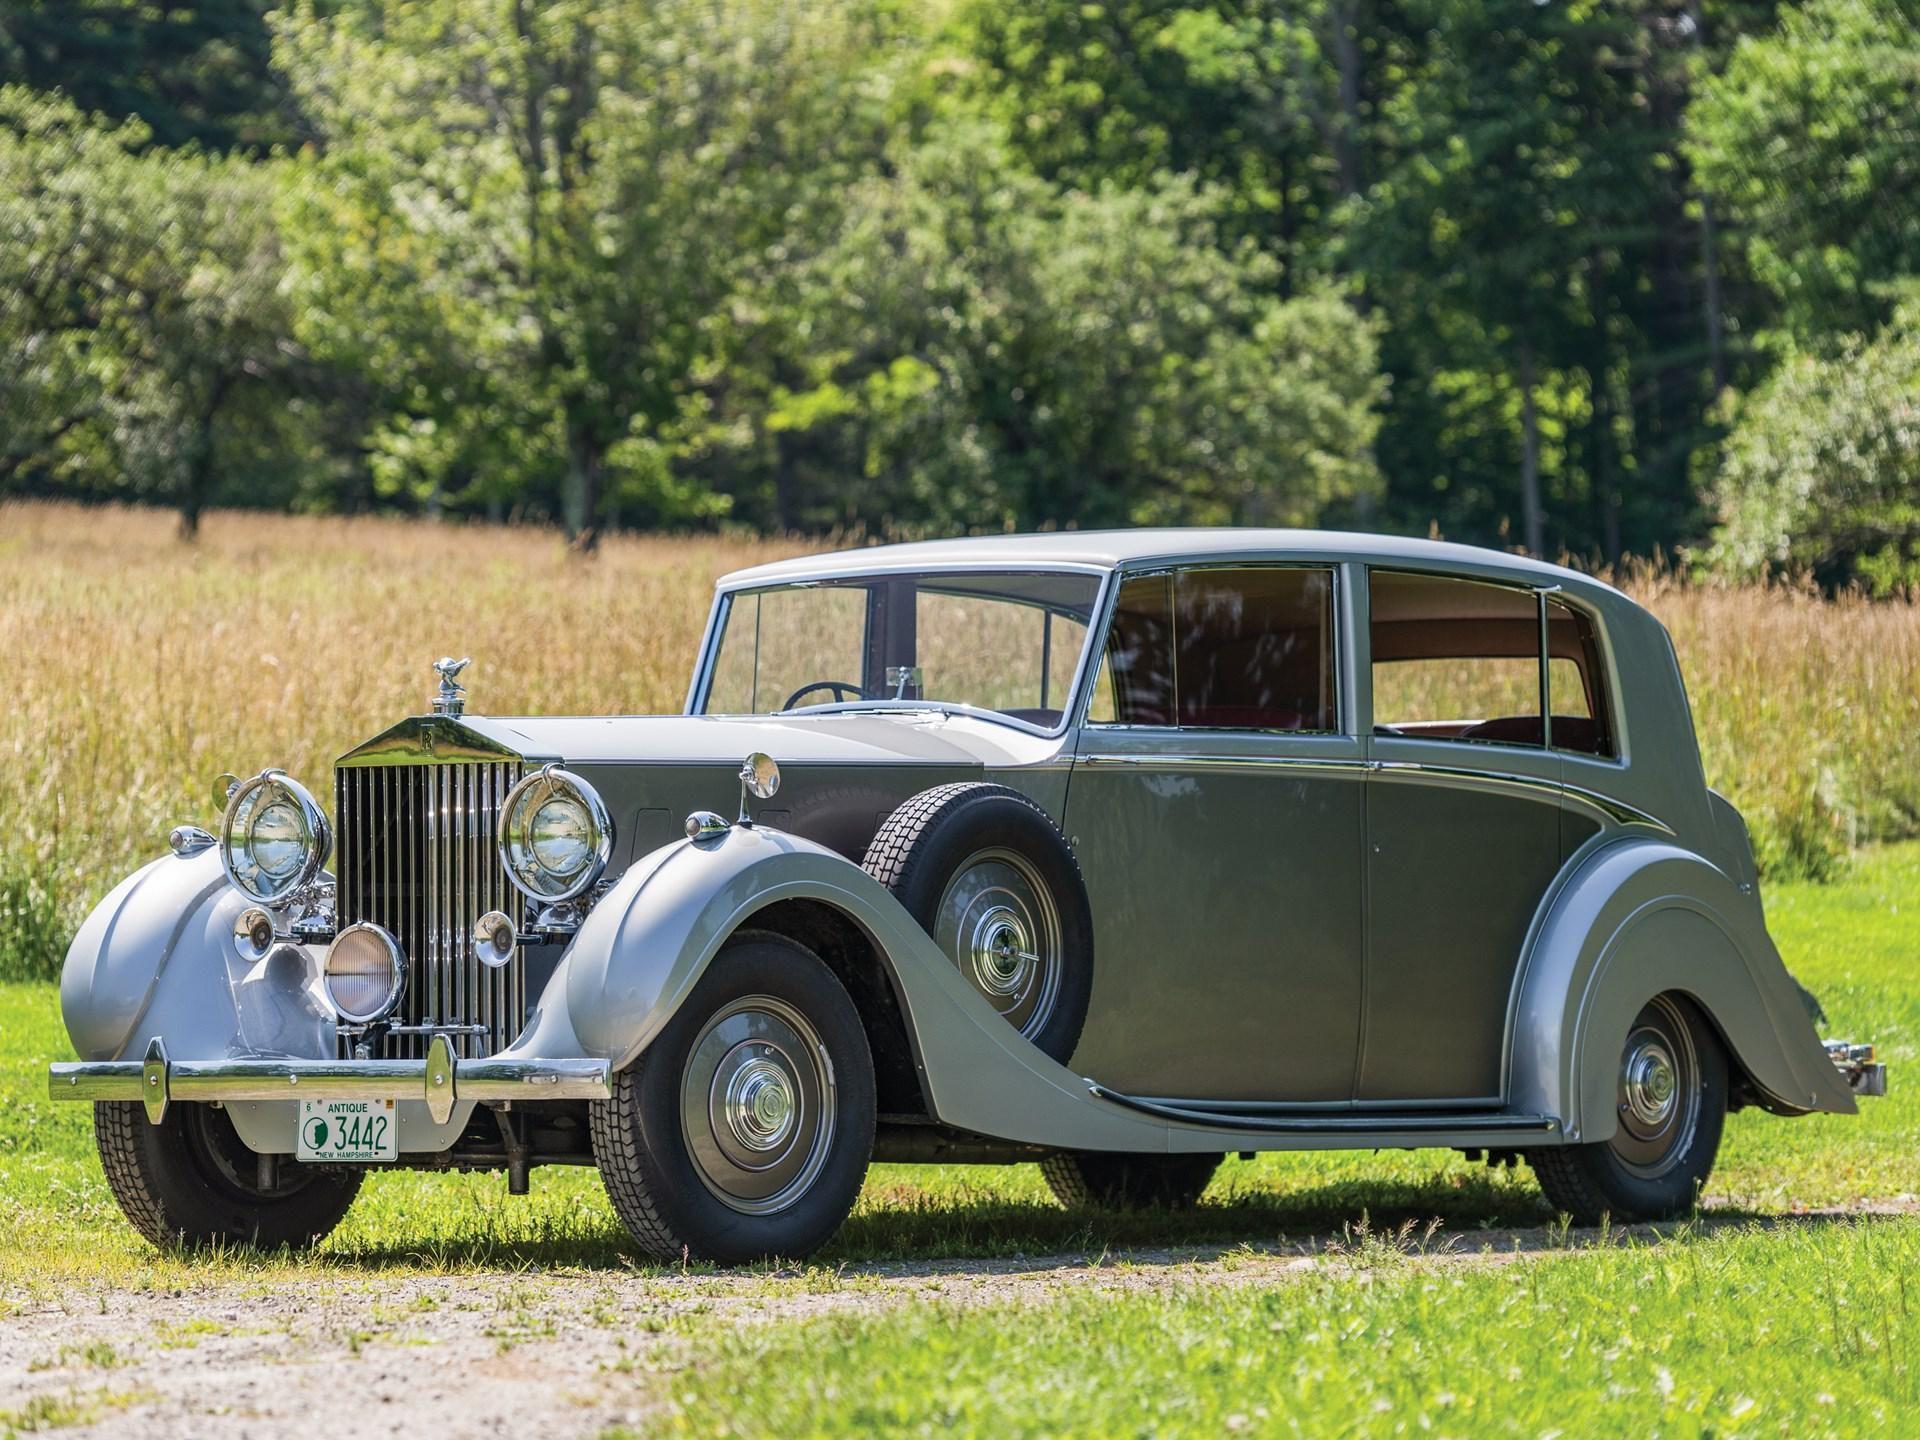 1939 Rolls-Royce Phantom III Limousine by h.j. Mulliner